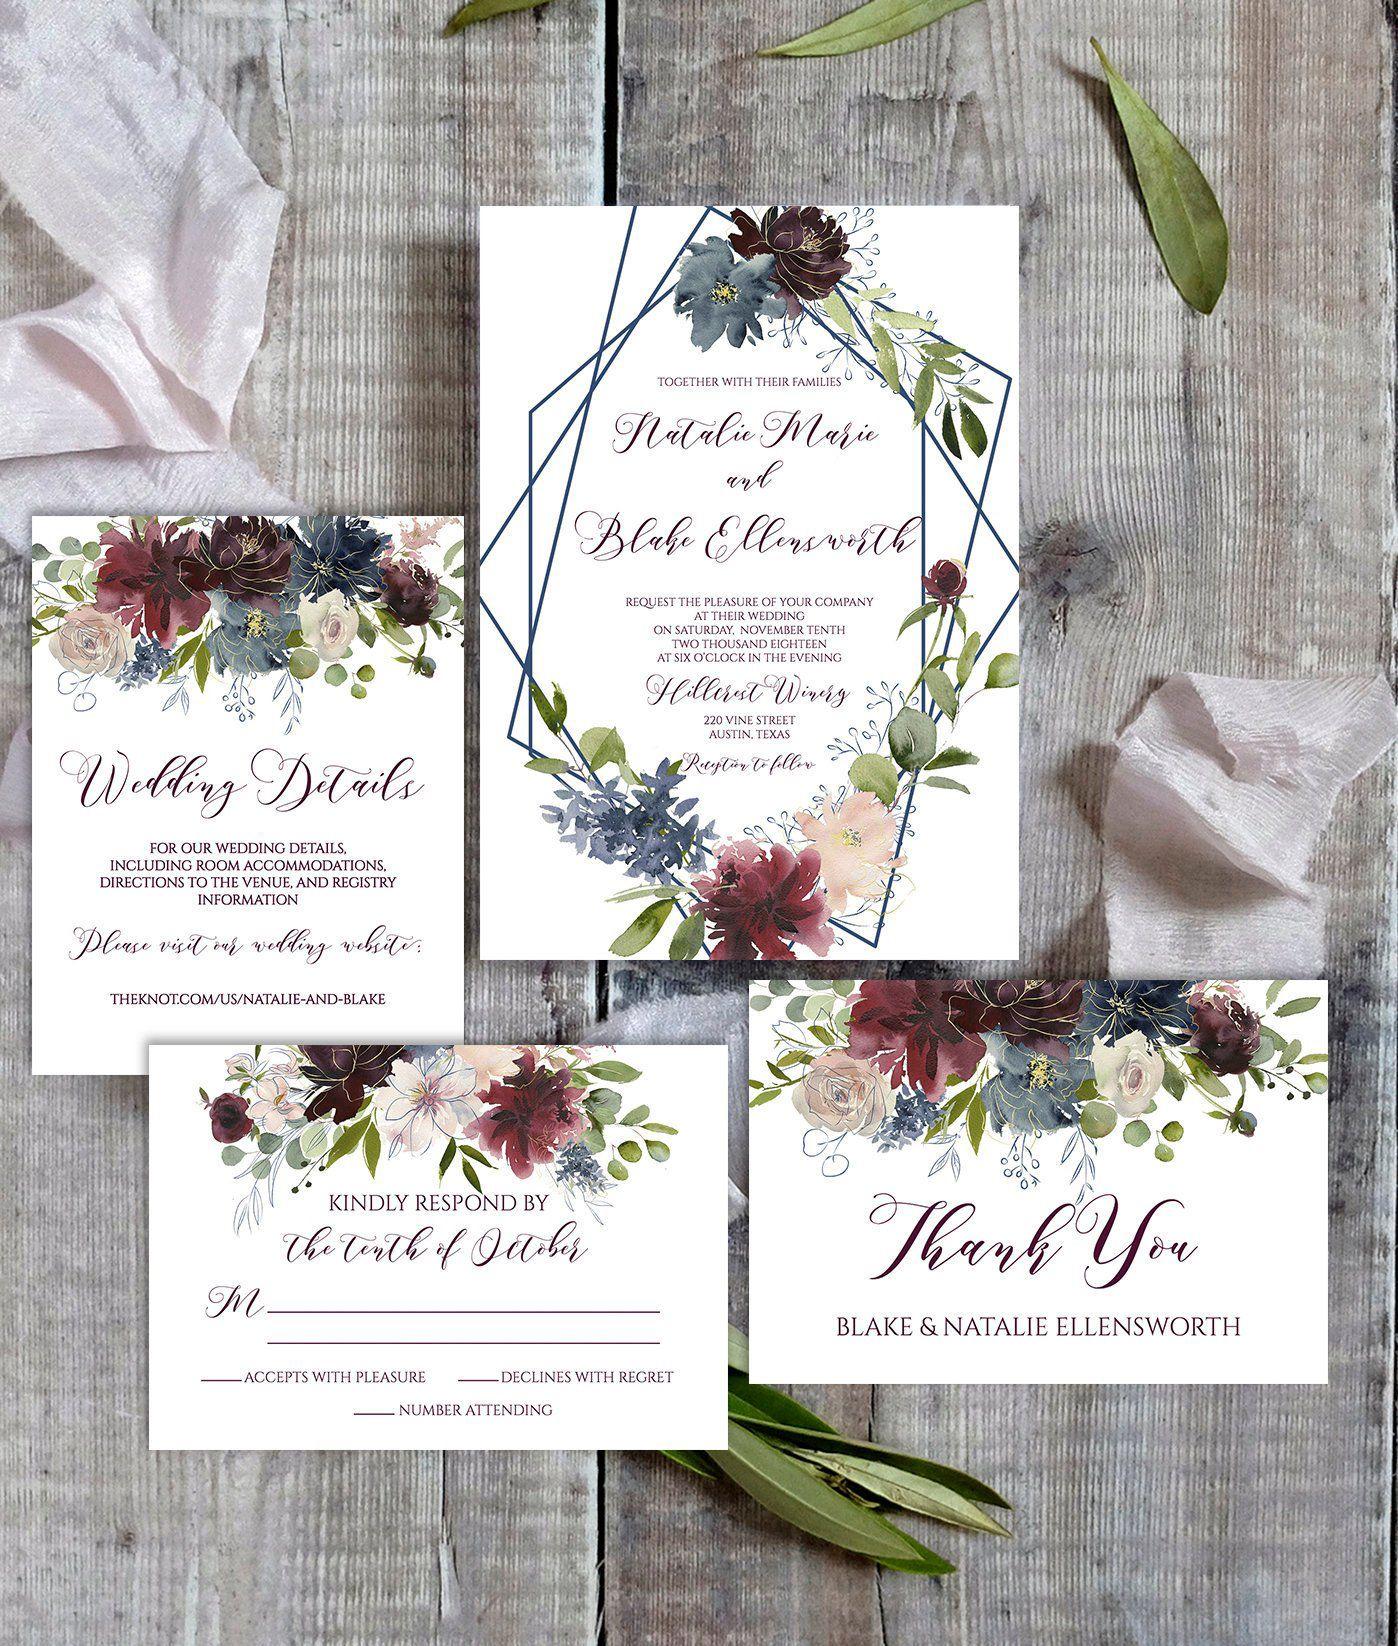 Printable Wedding Invitation Template Wedding Invitation Etsy Etsy Wedding Invitations Cheap Wedding Invitations Printable Wedding Invitations